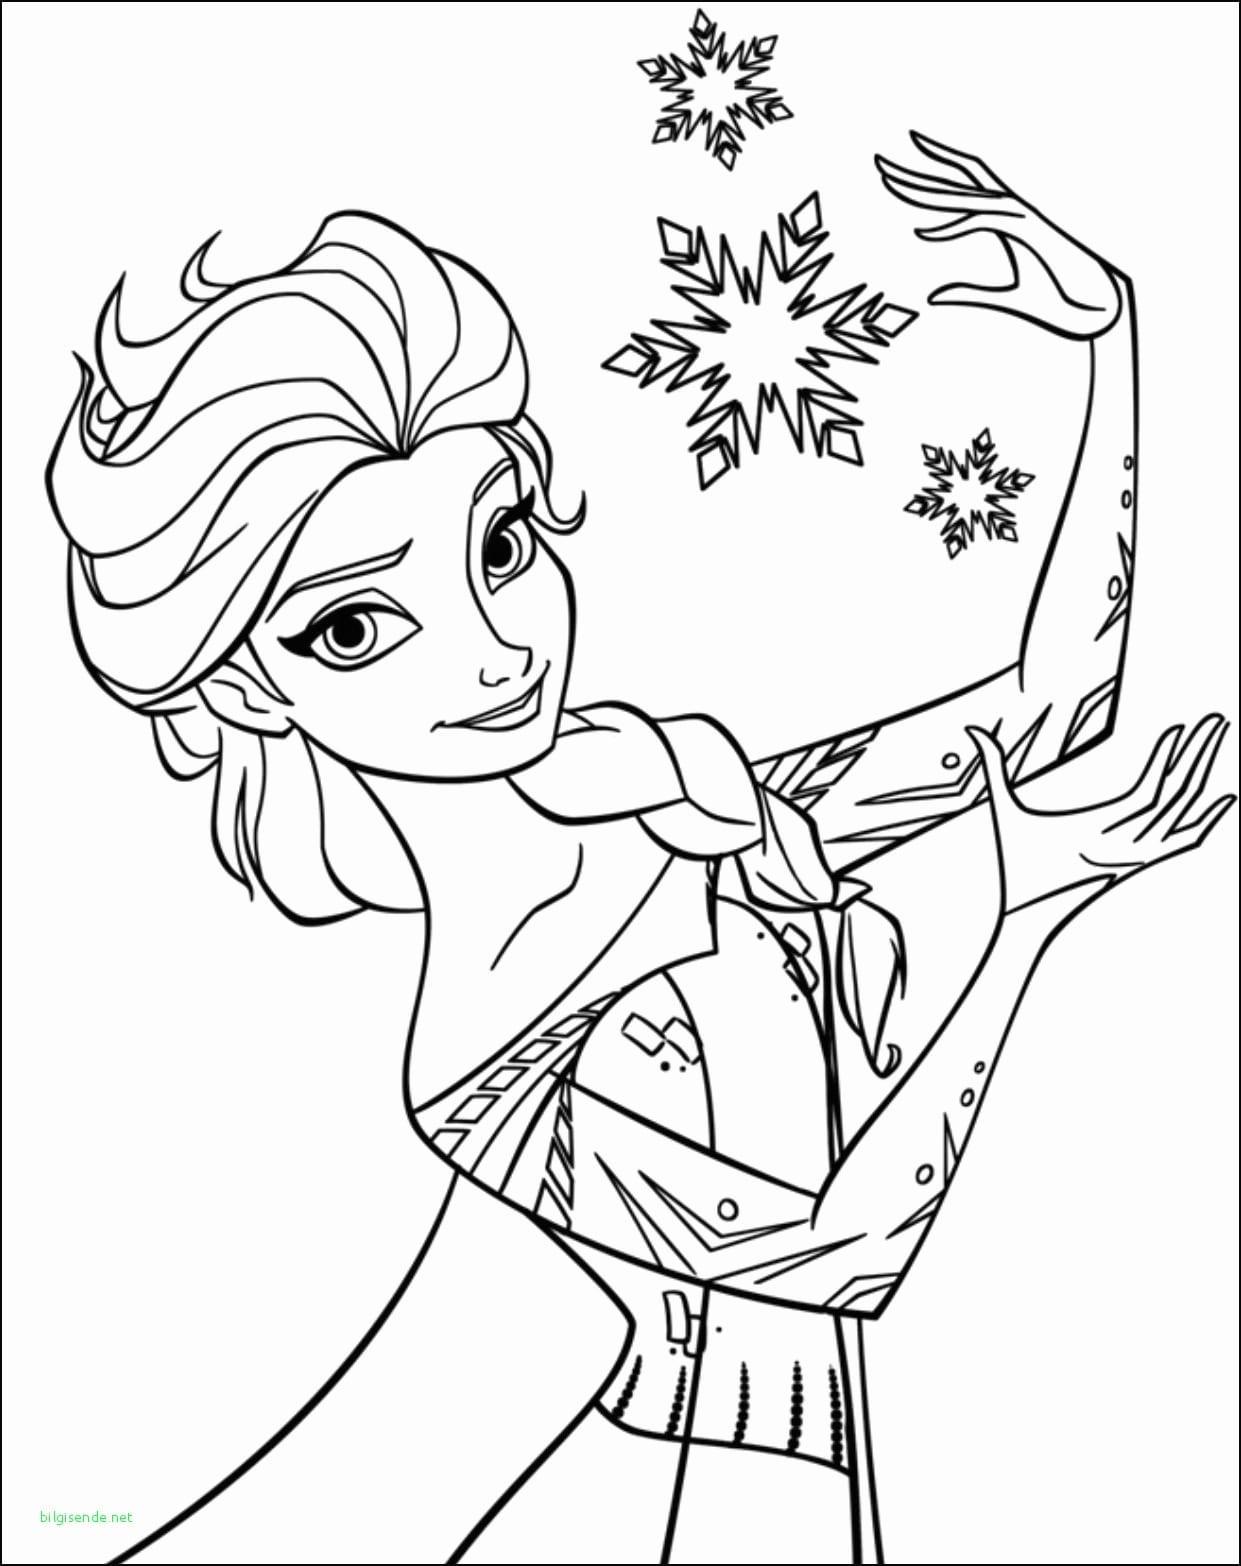 Ausmalbilder Prinzessin sofia Neu Disney Prinzessinnen Prinzessin Ausmalbild D0dg Galerie